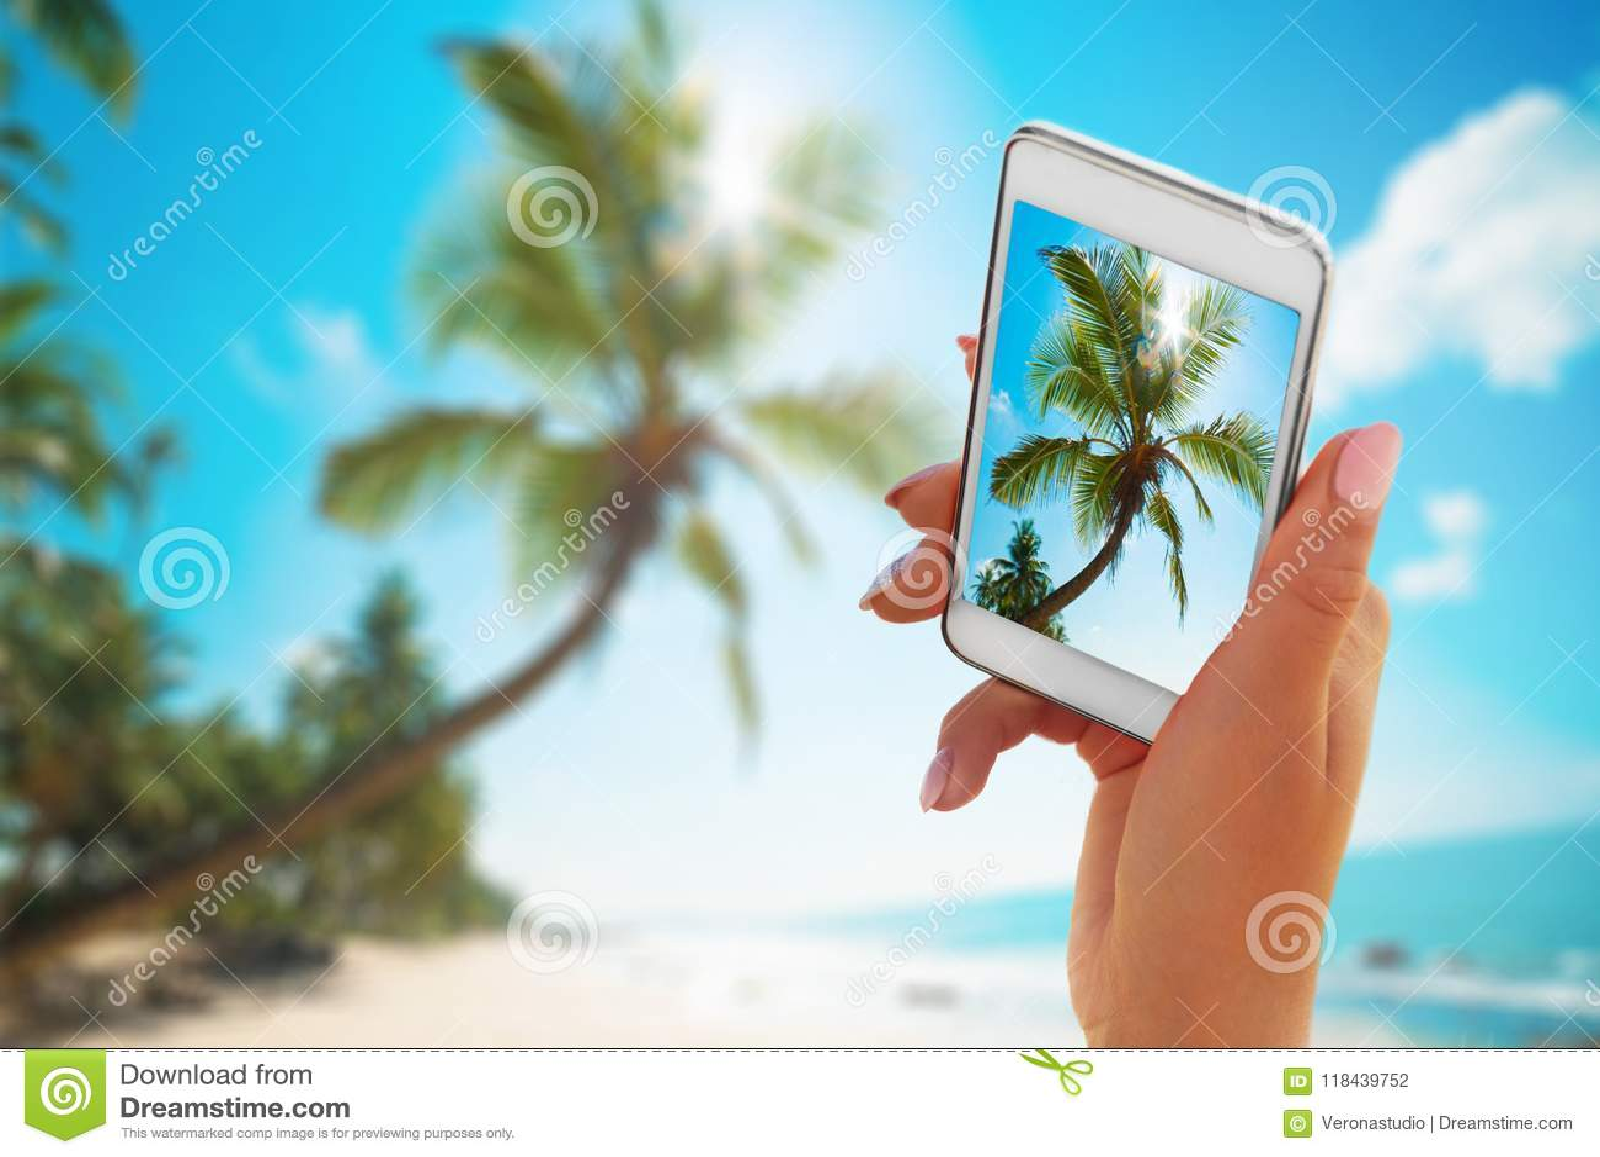 Sluit omhoog smartphone van de handholding op de zomerstrand technologie, reis, toerisme, mededeling en mensenconcept